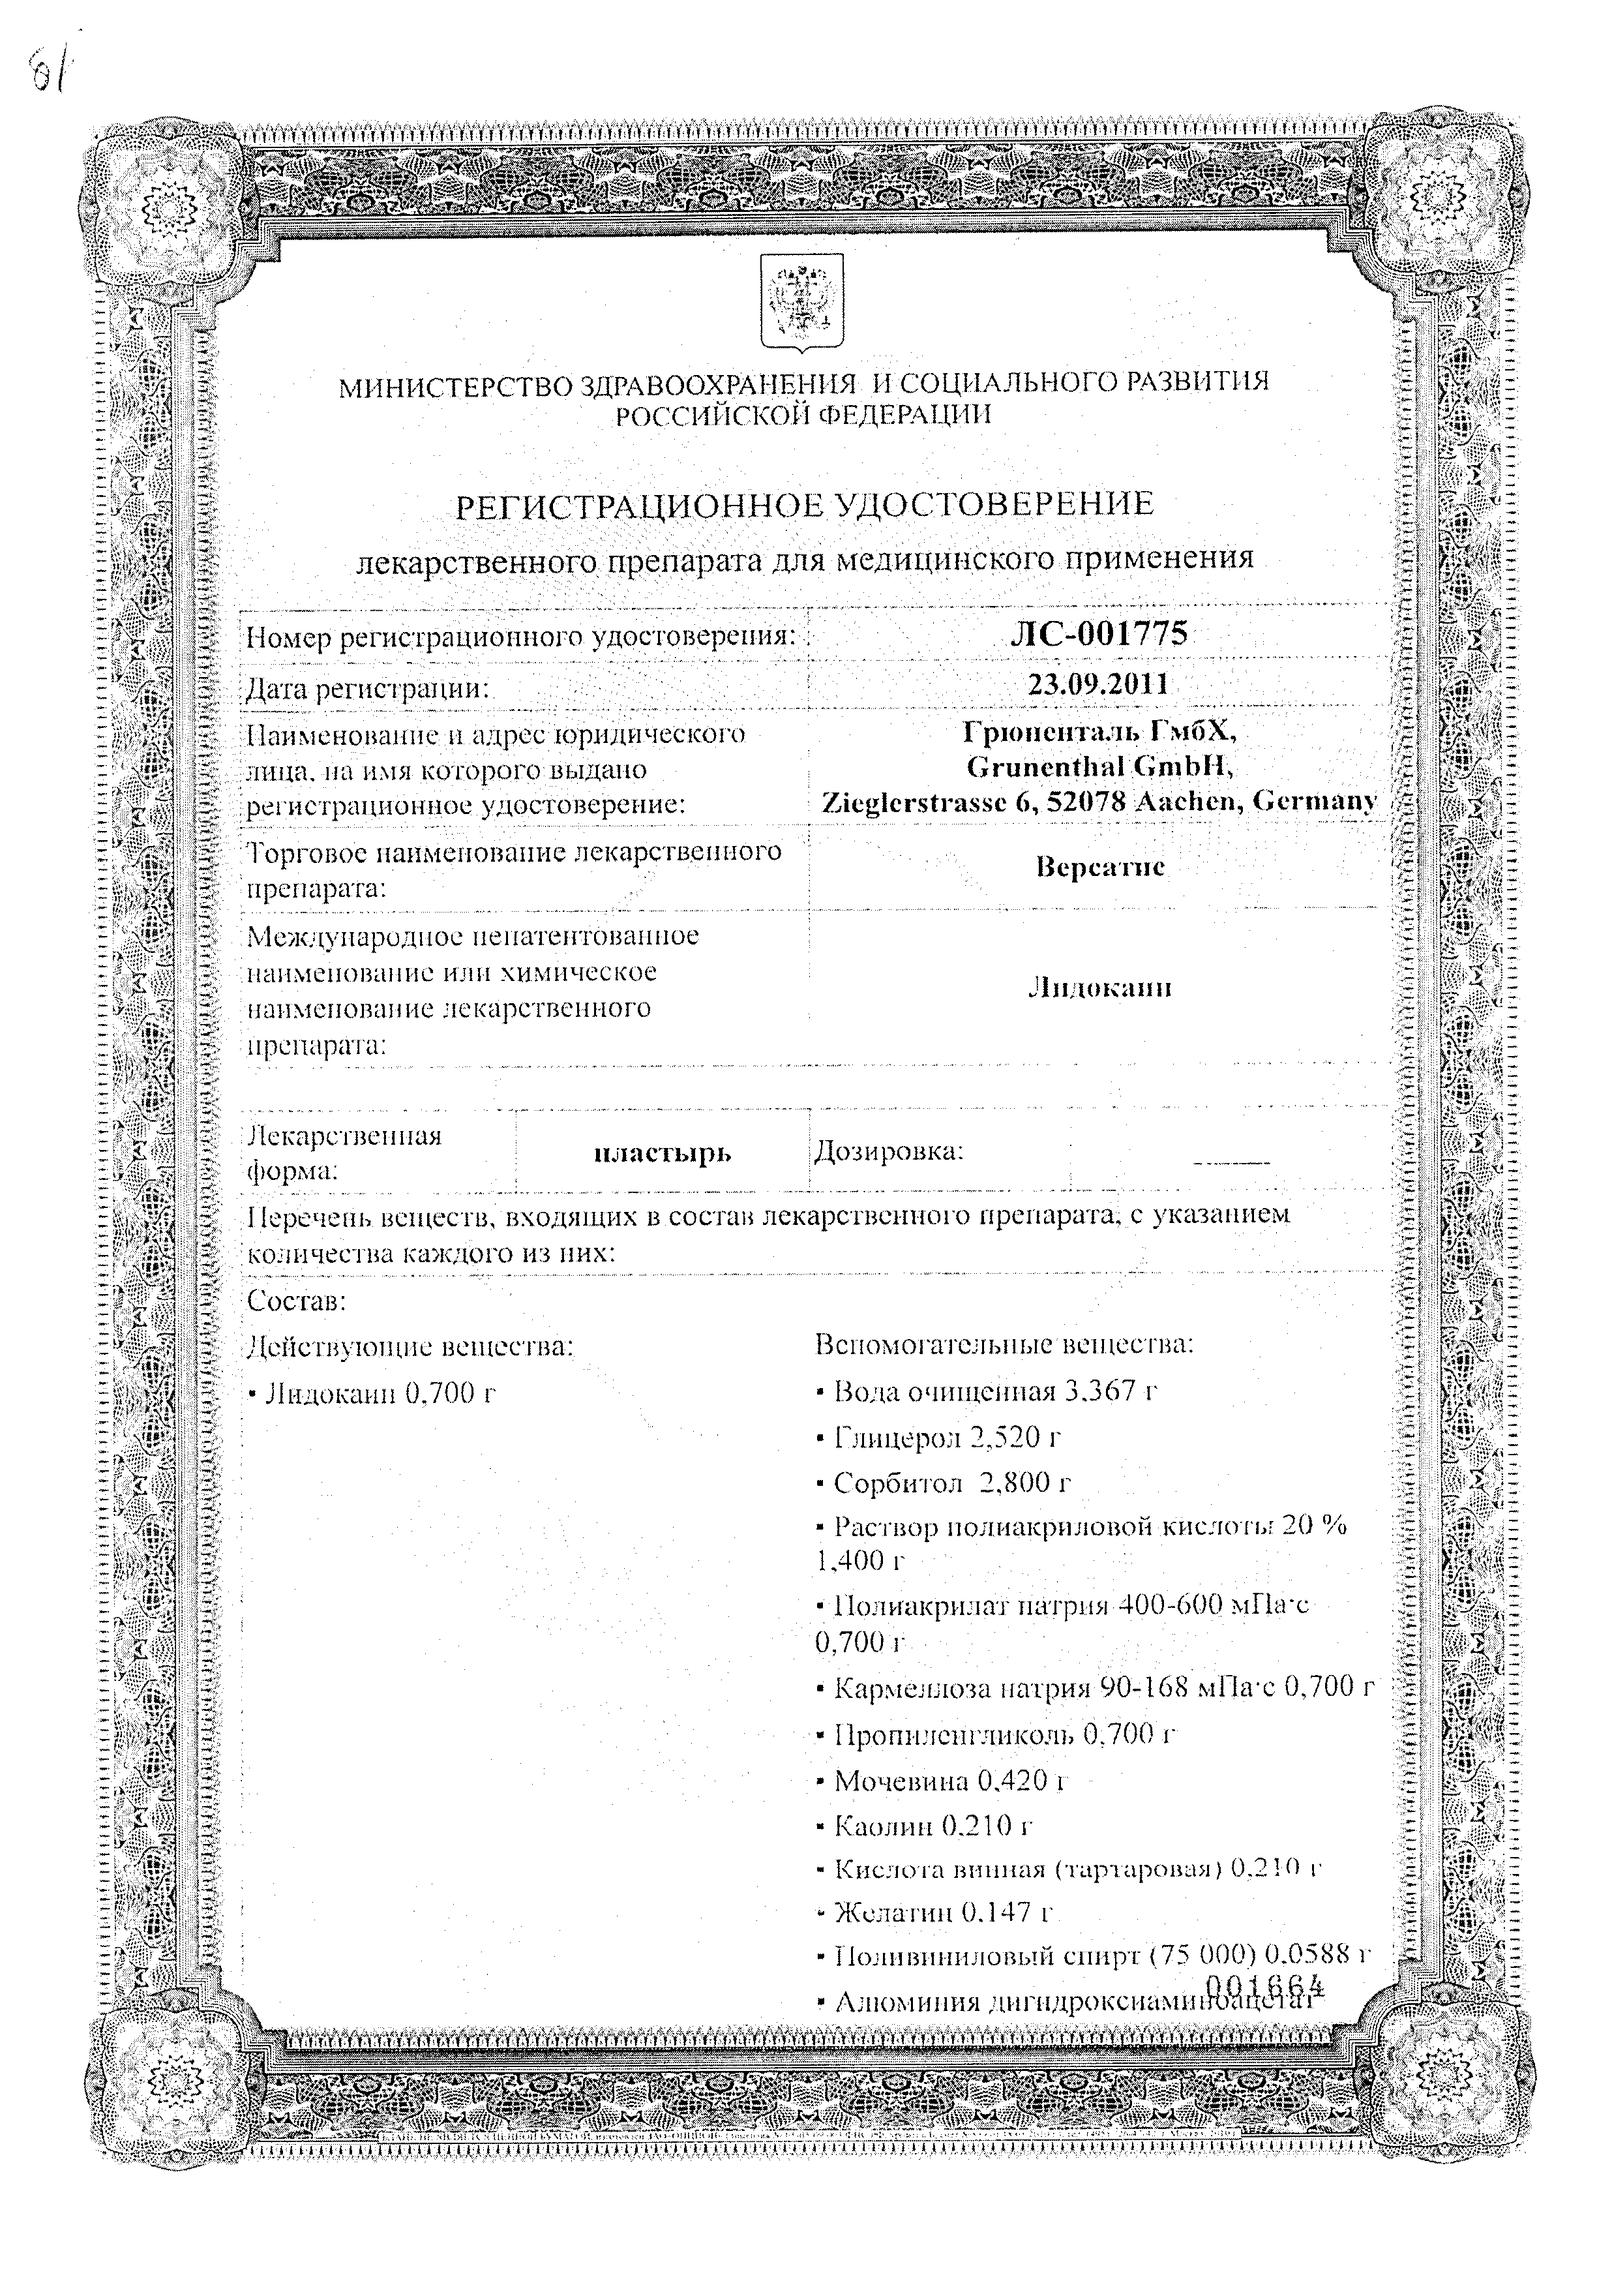 Версатис сертификат